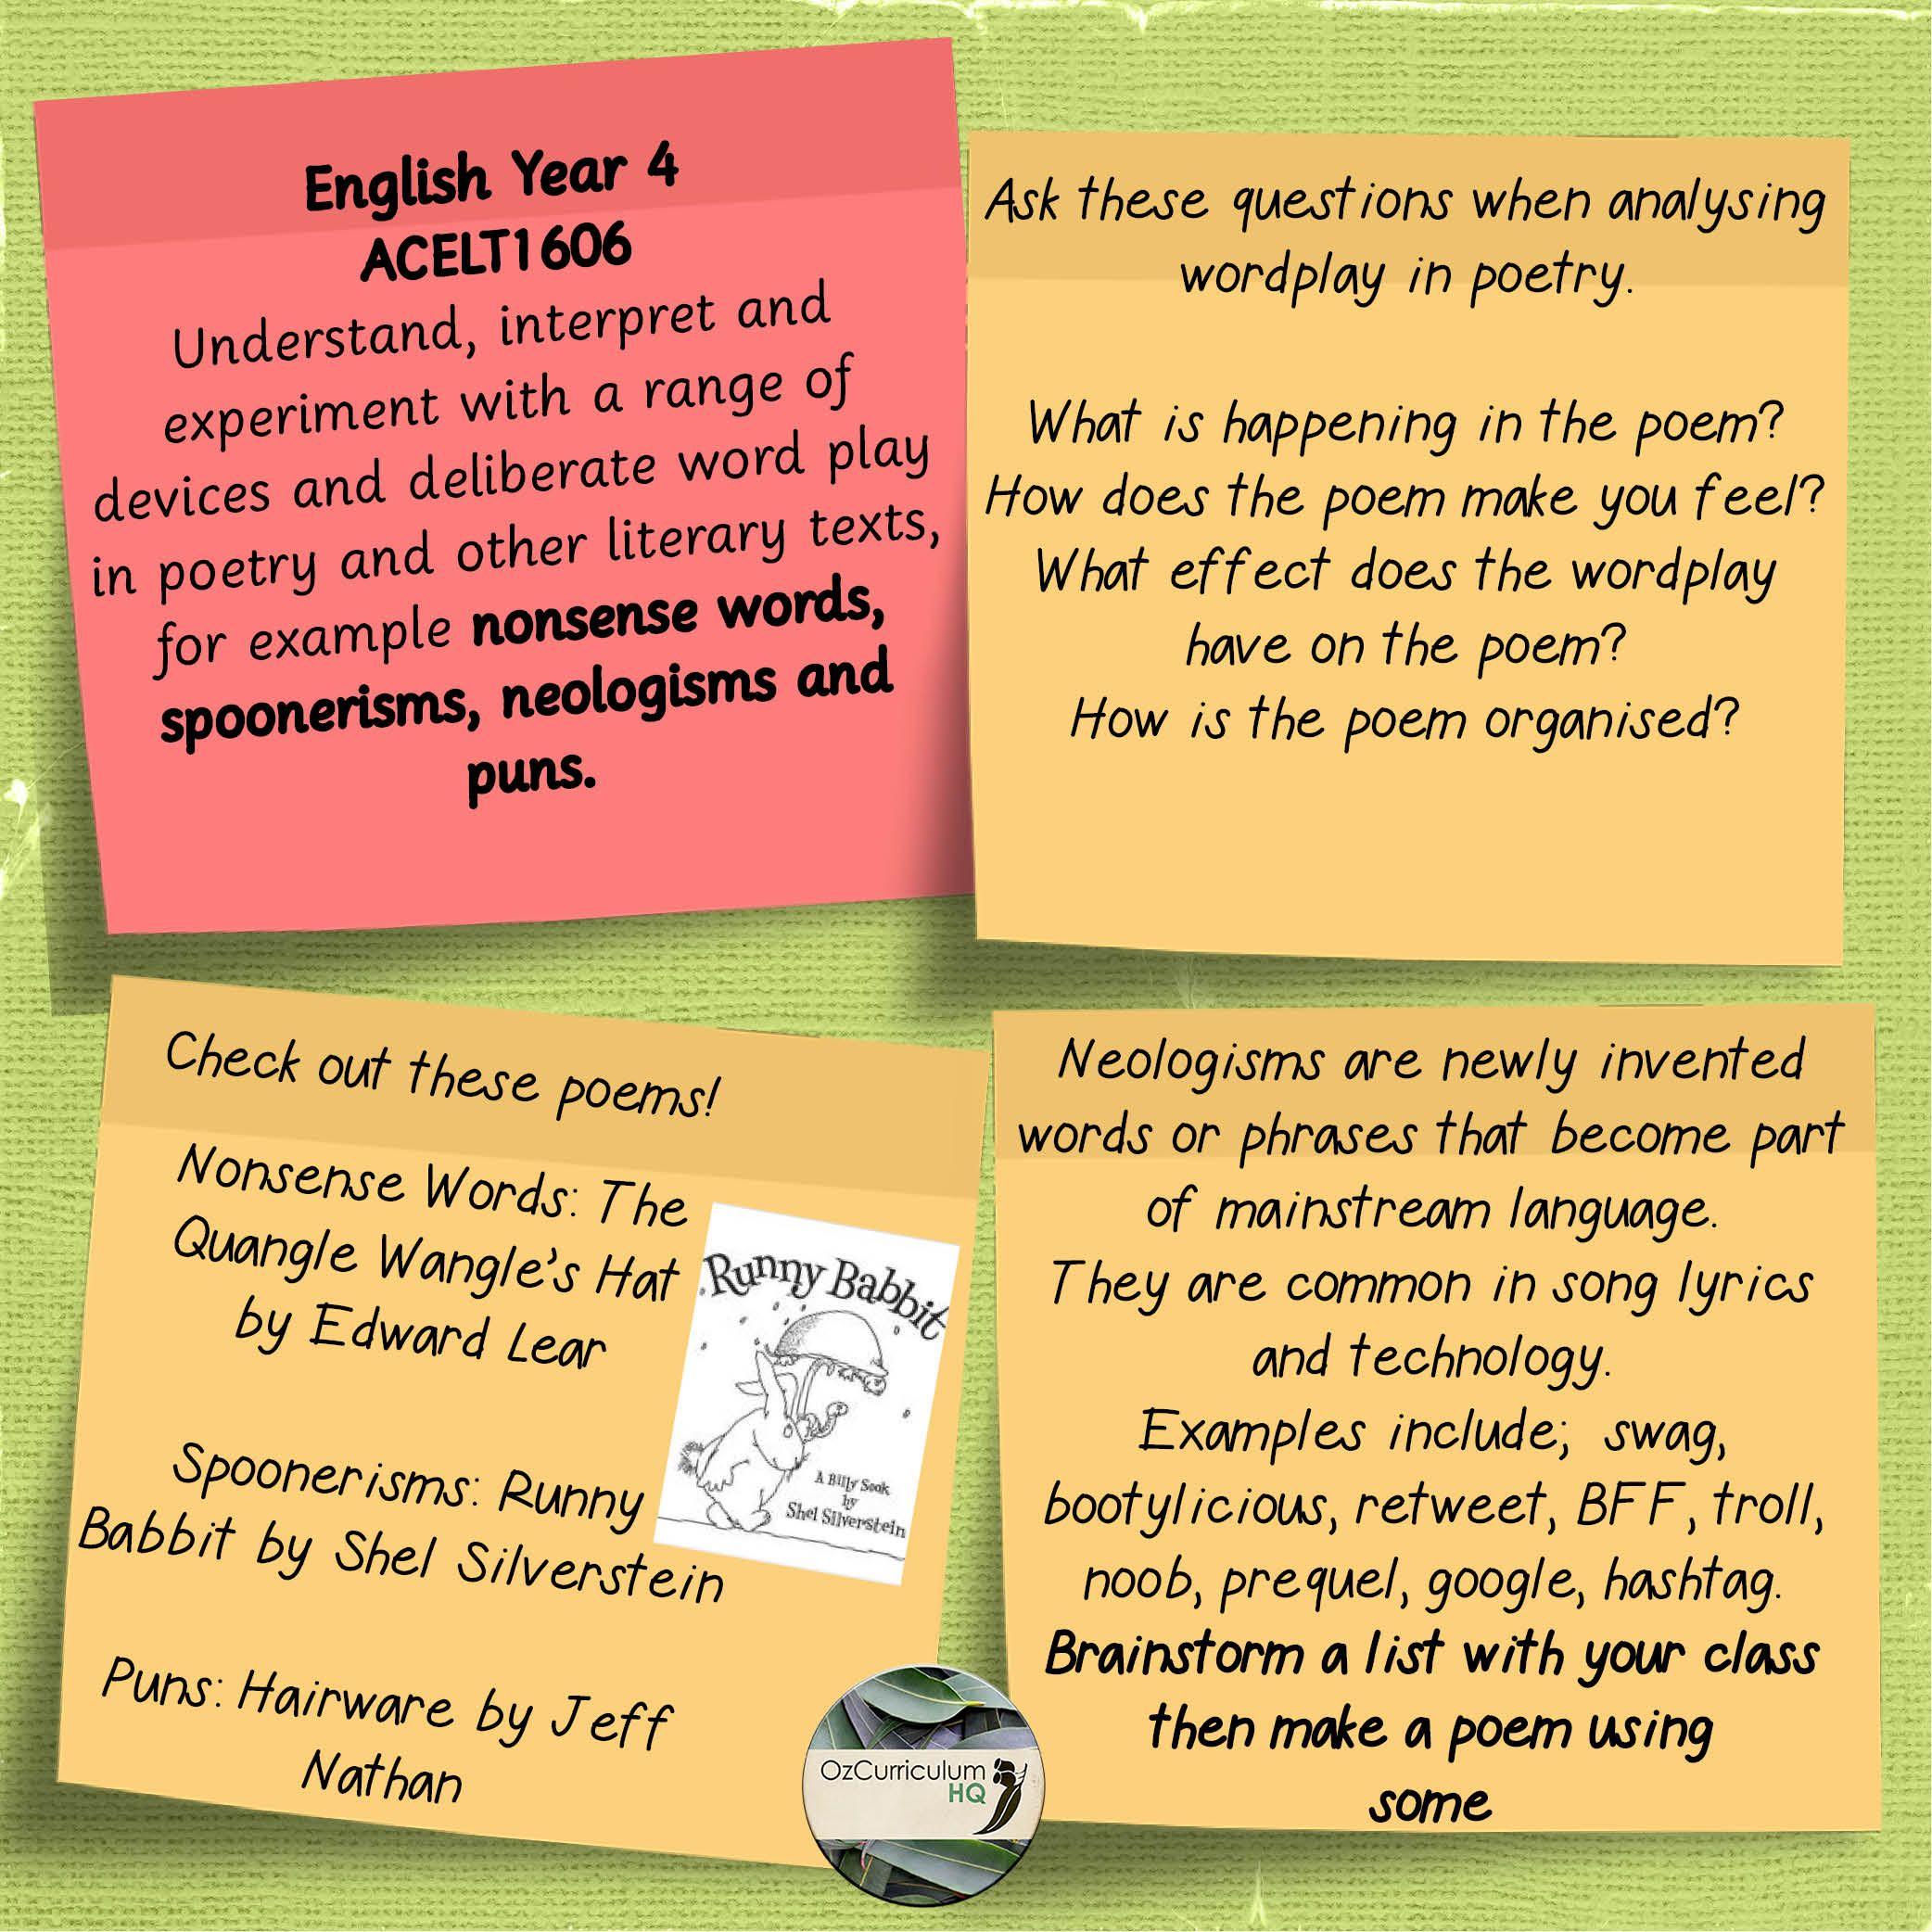 worksheet Spoonerisms Worksheet english year 4 acelt1606 nonsense words spoonerisms neologisms and puns